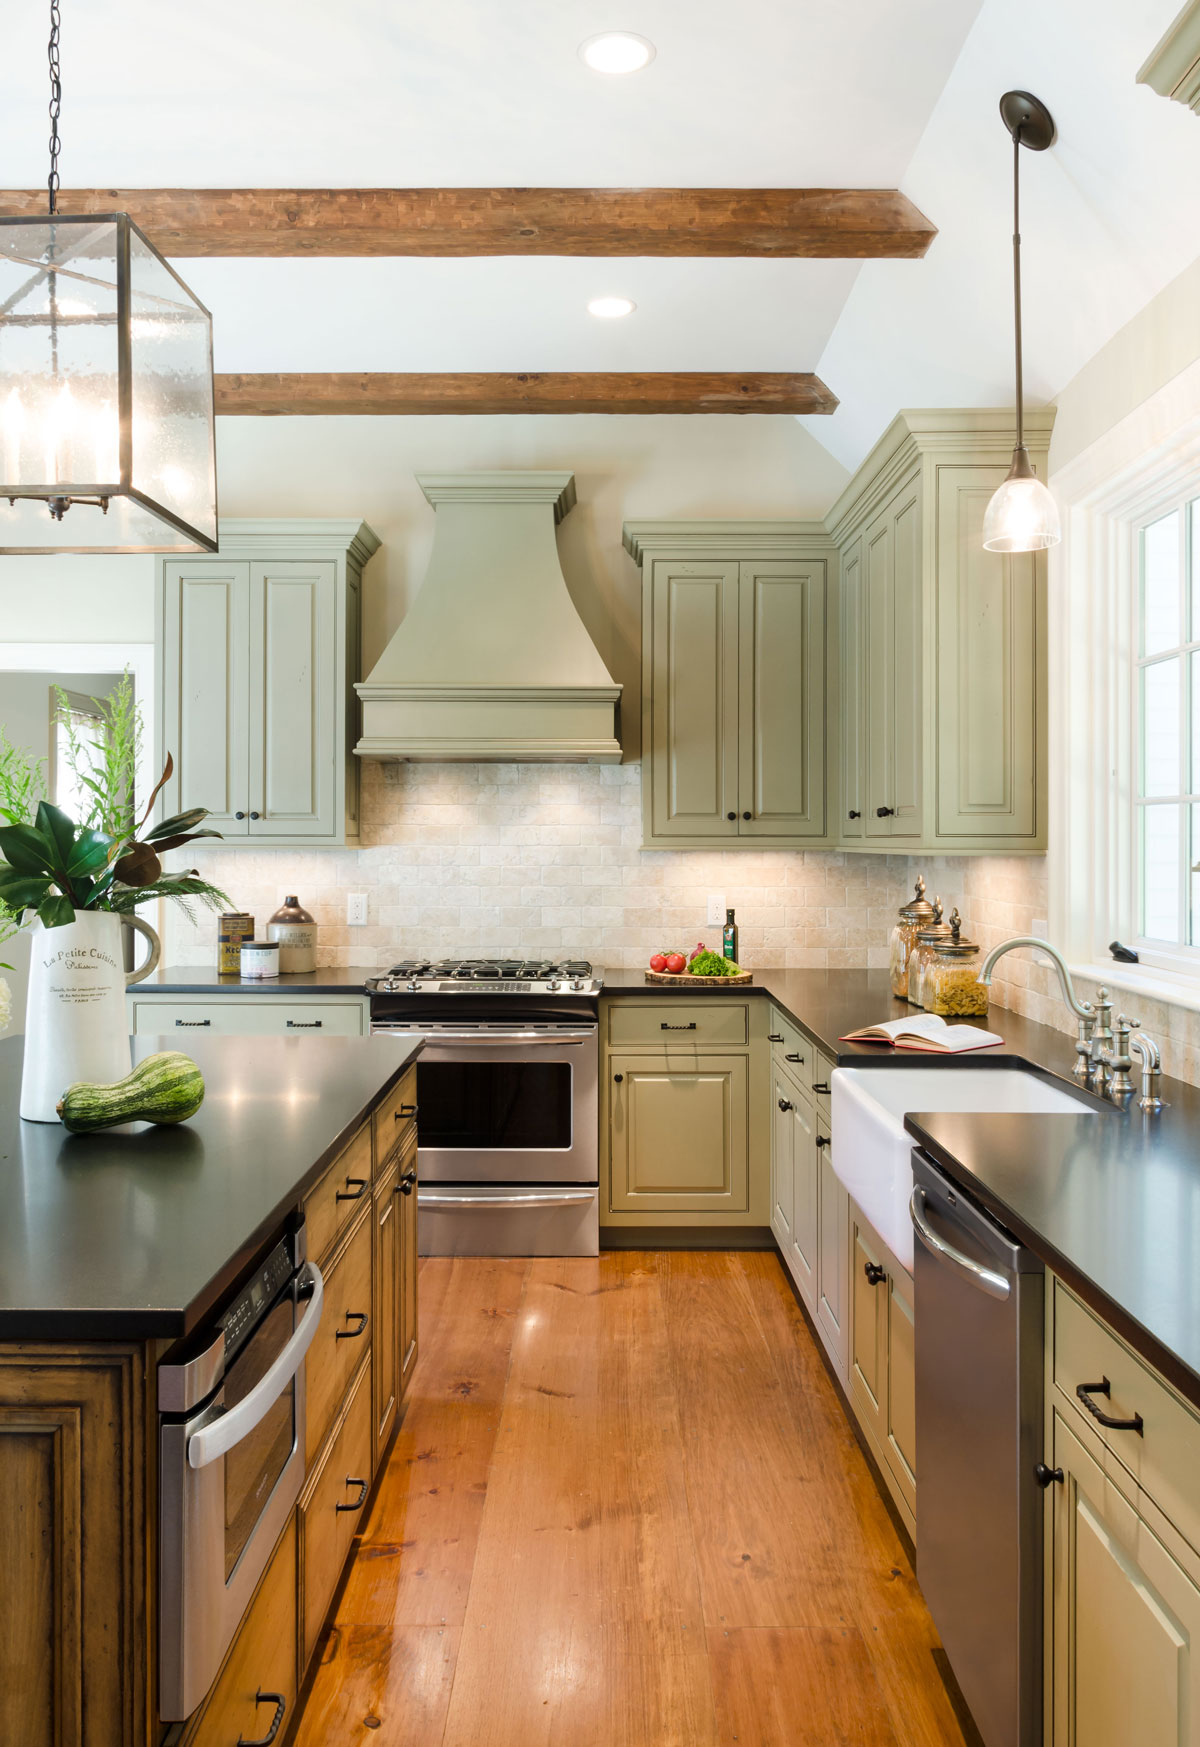 Duxbury, Ma kitchen interior design